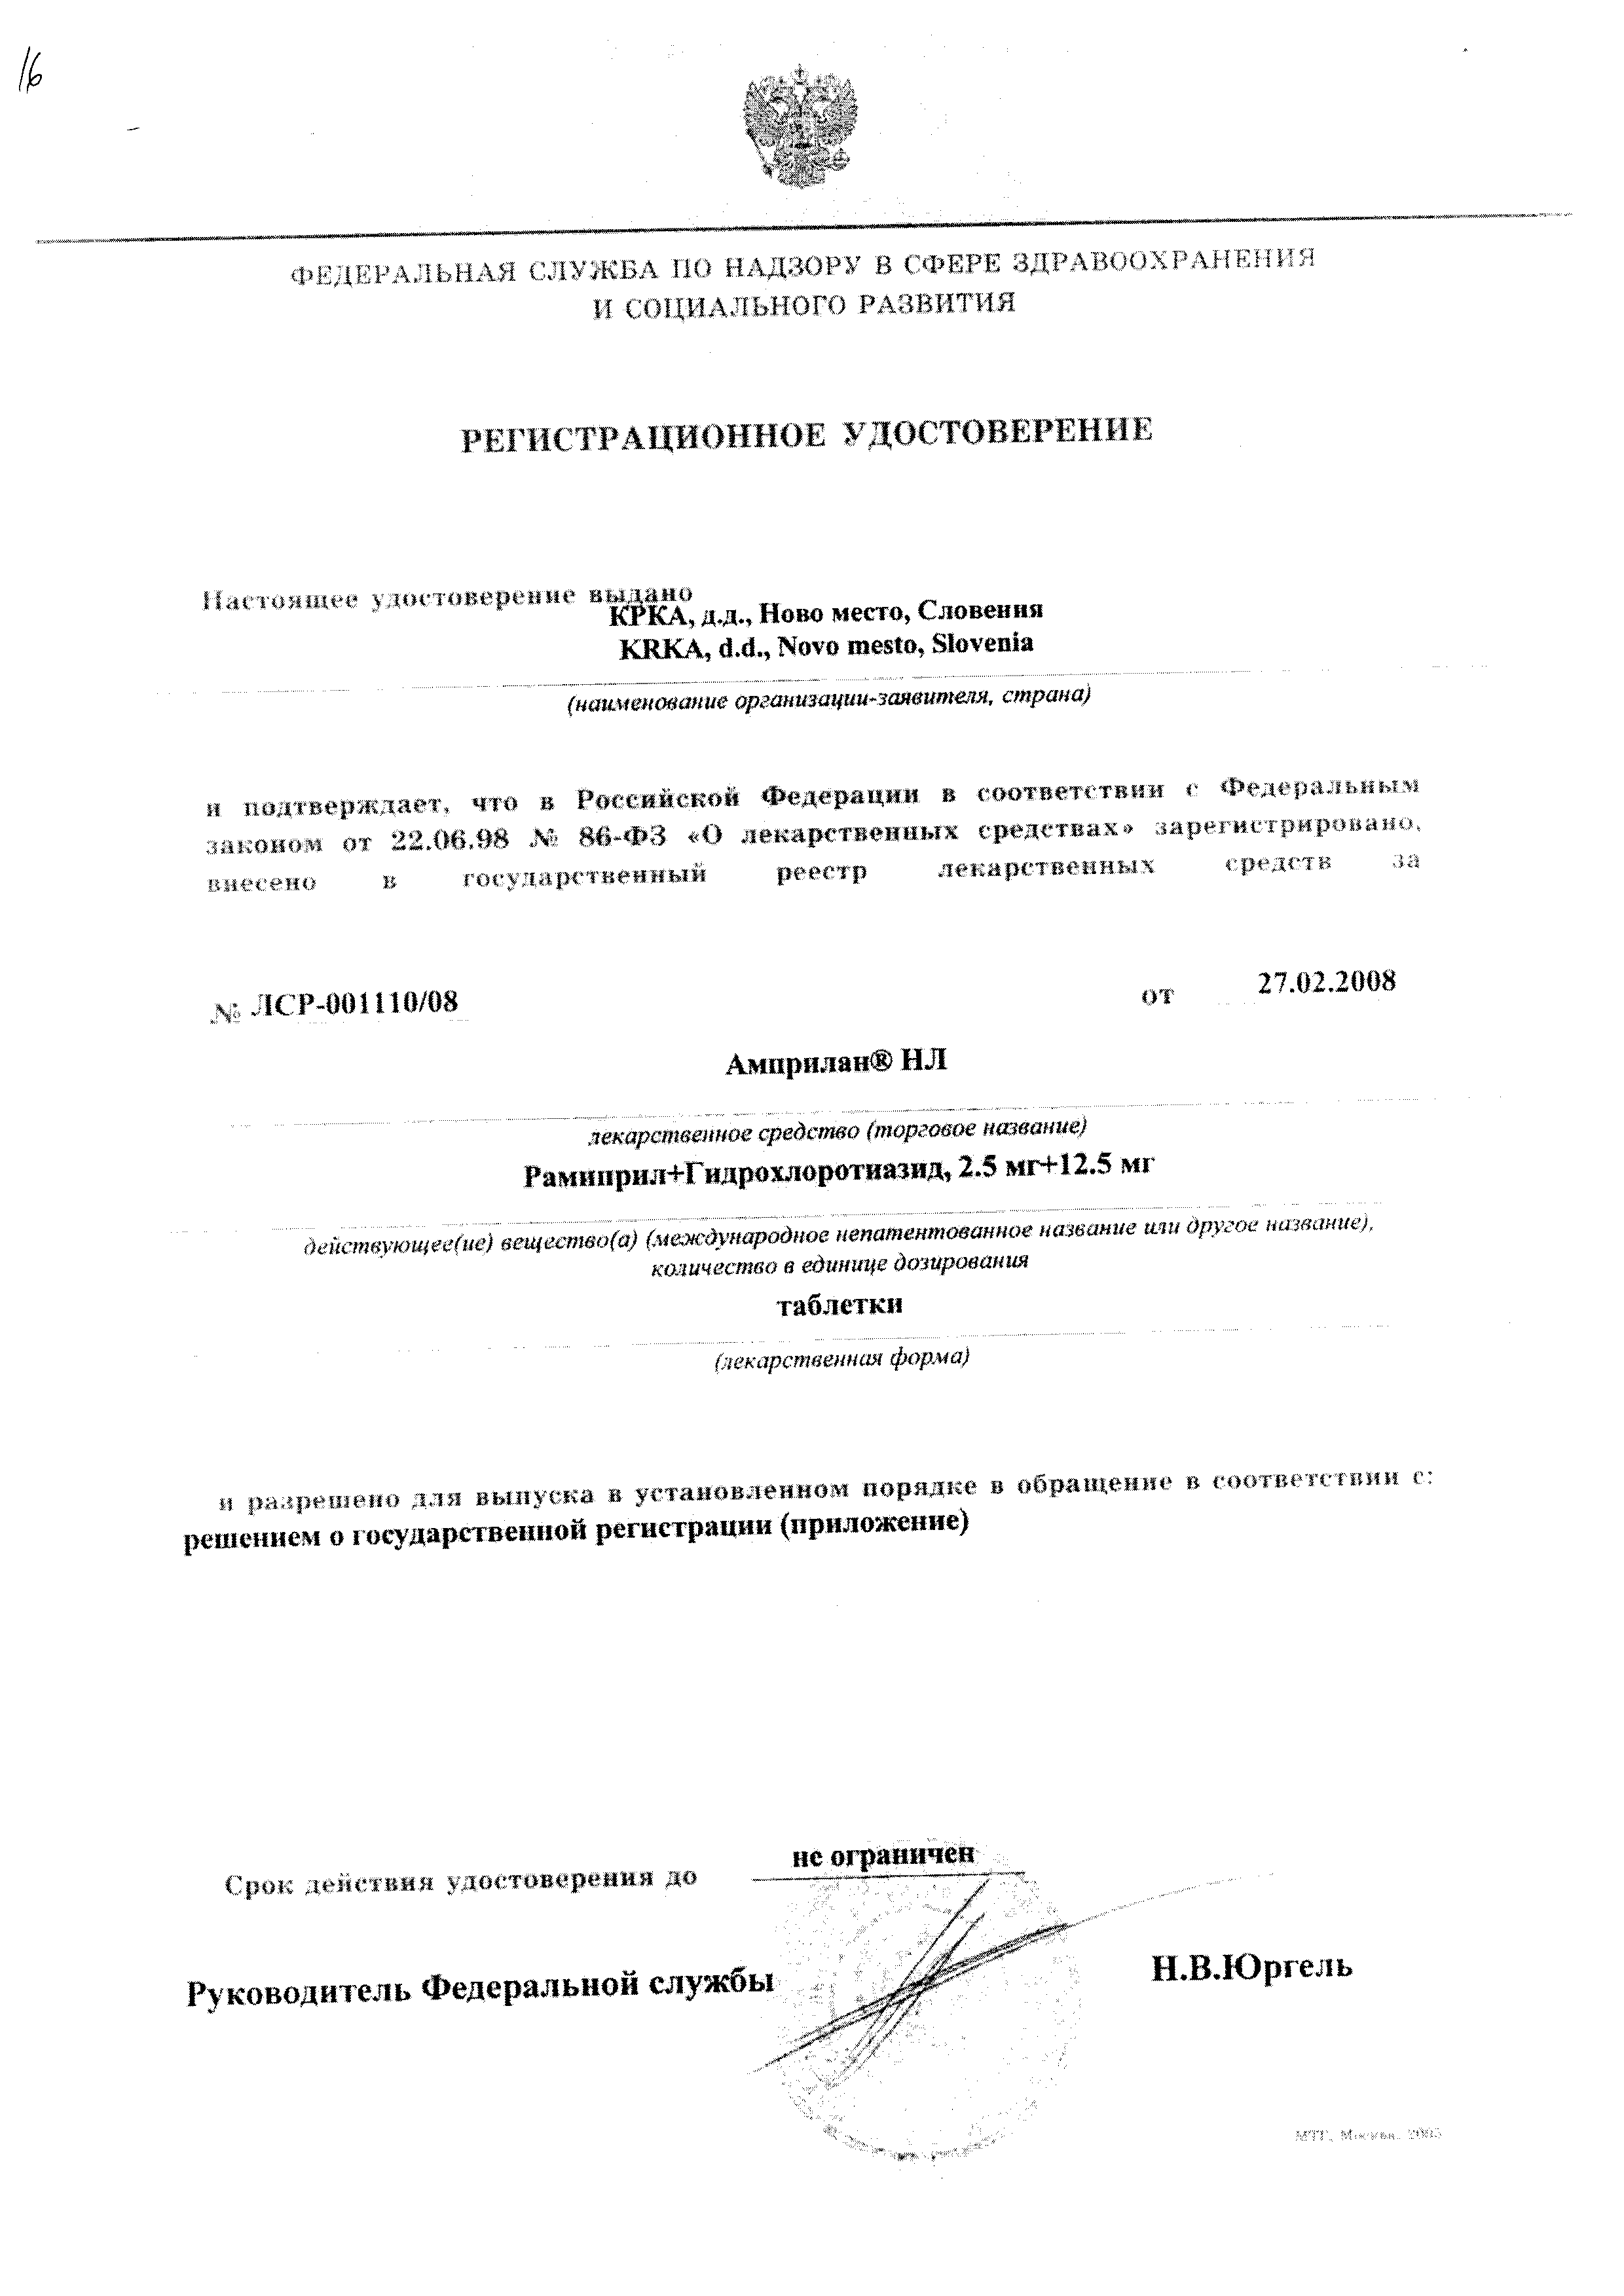 Амприлан НЛ сертификат